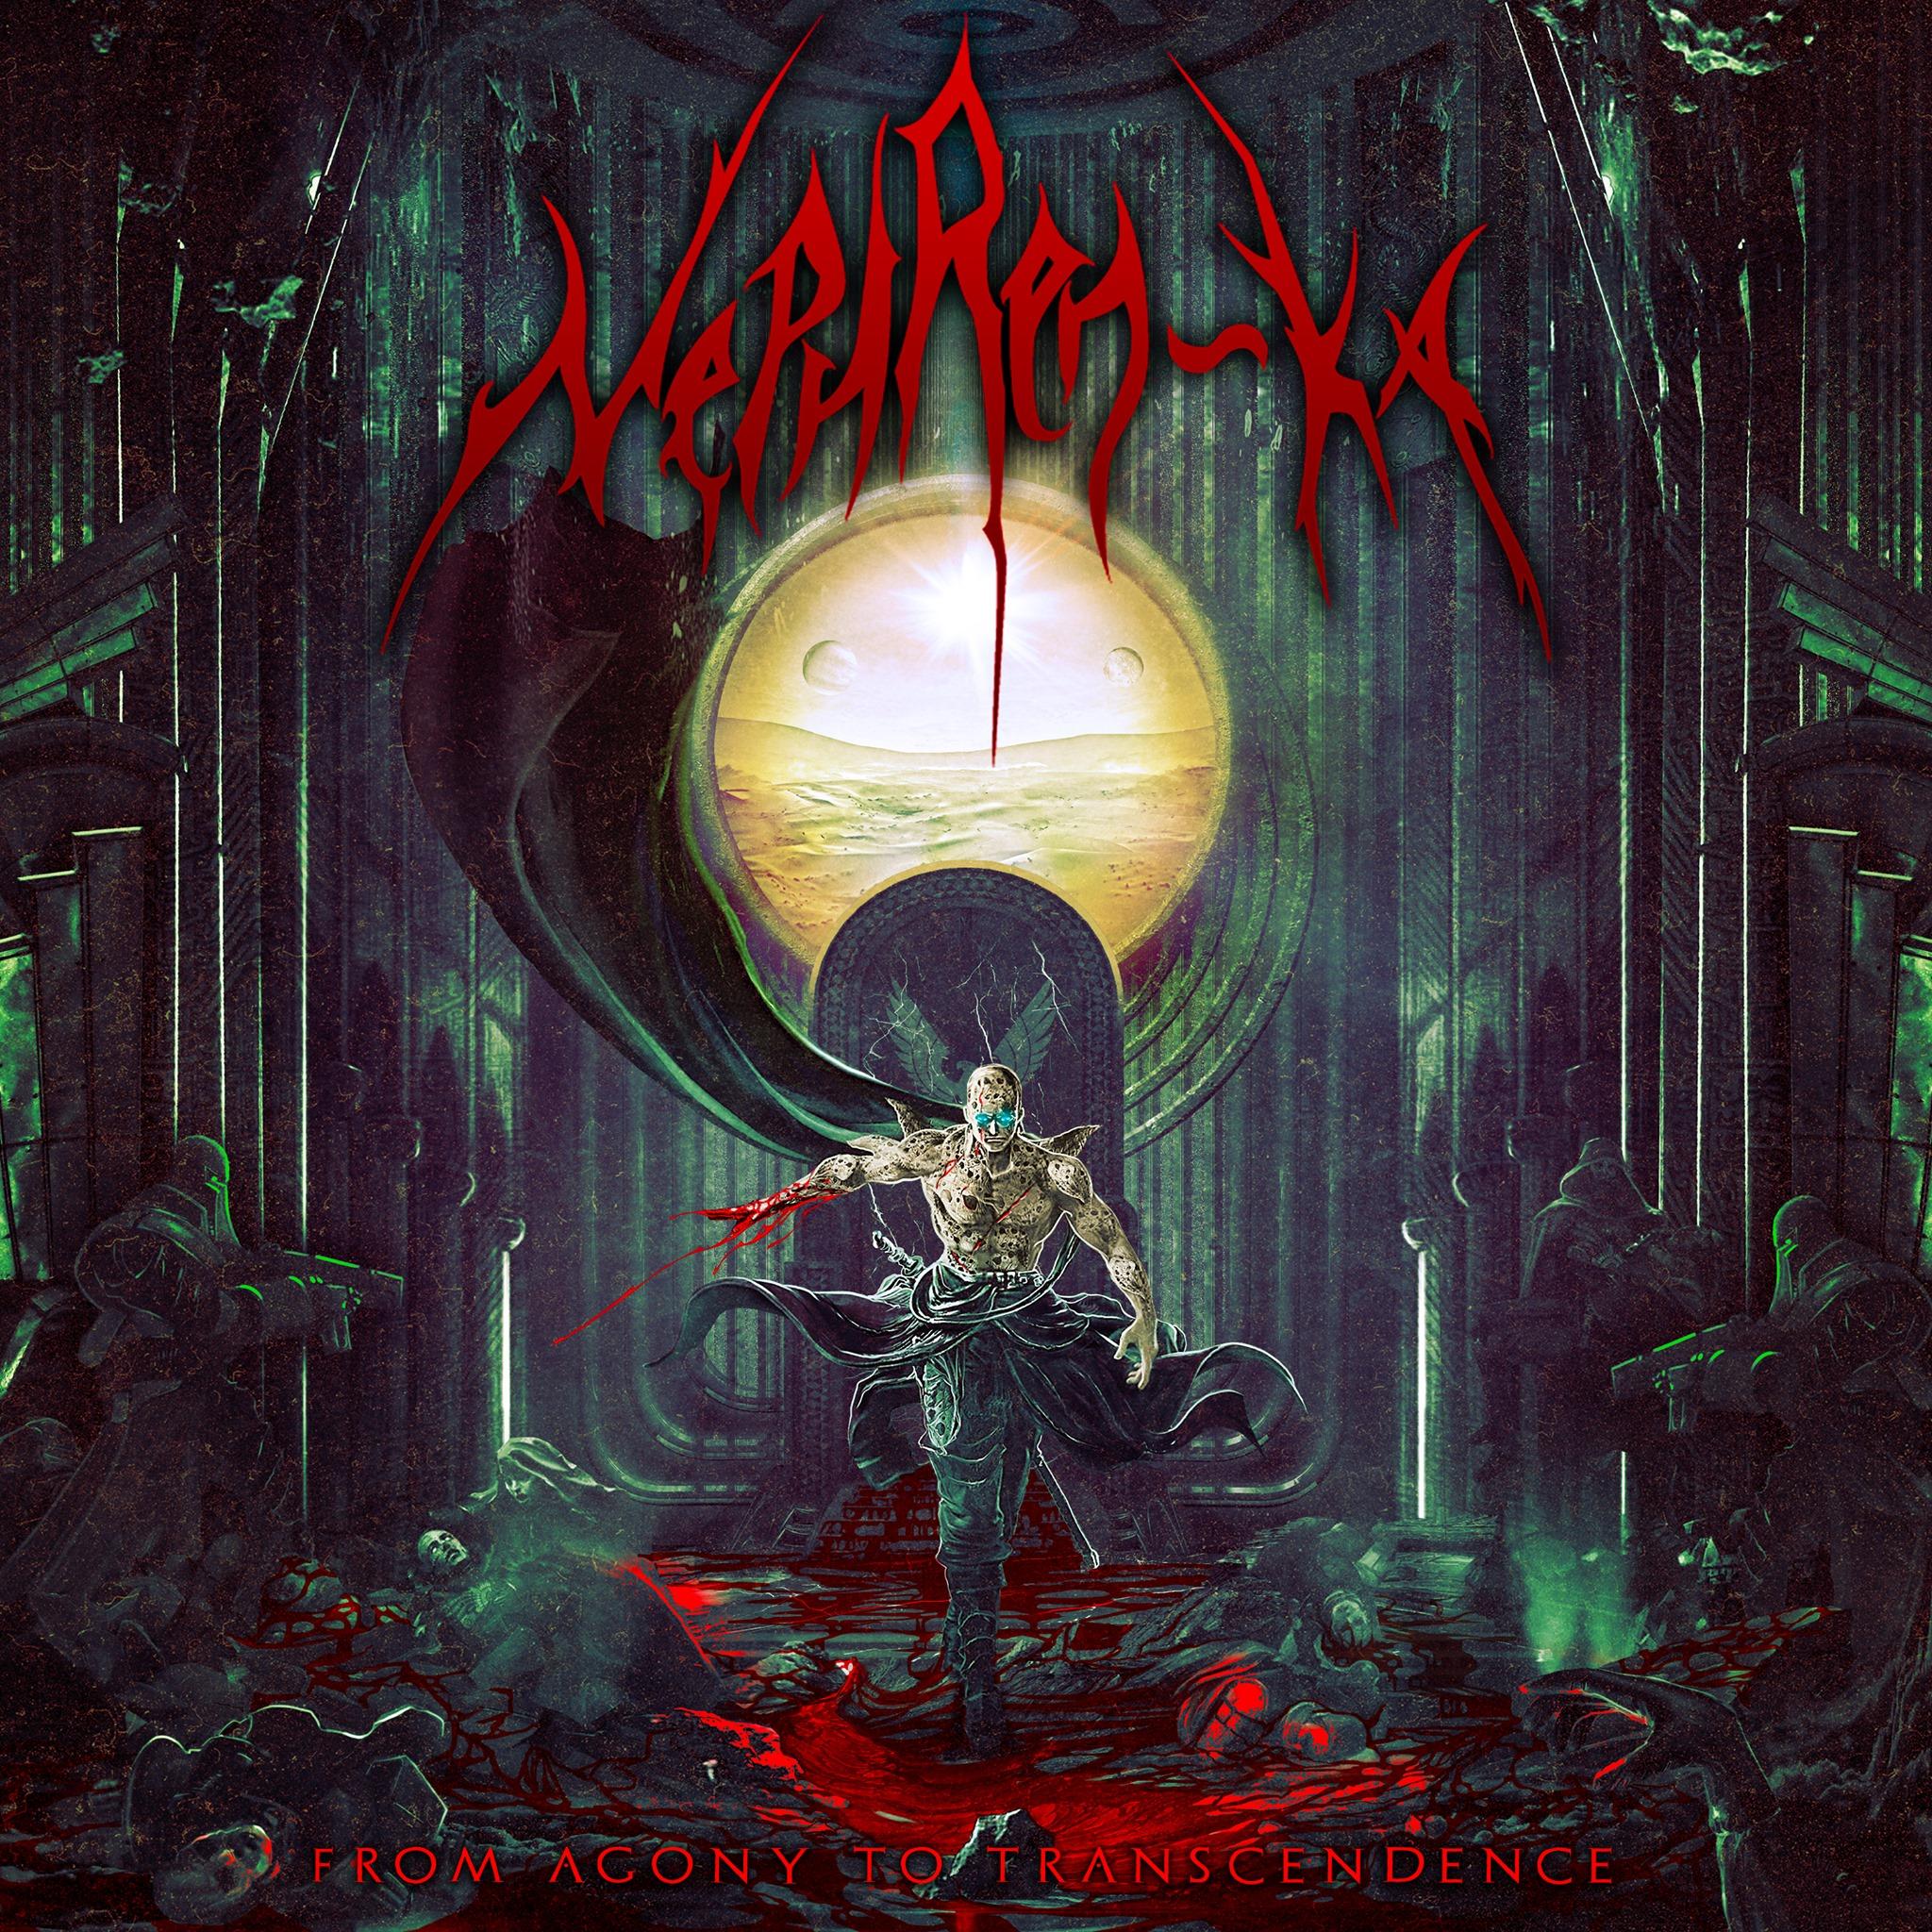 NEPHREN-KA from agony to transcendance